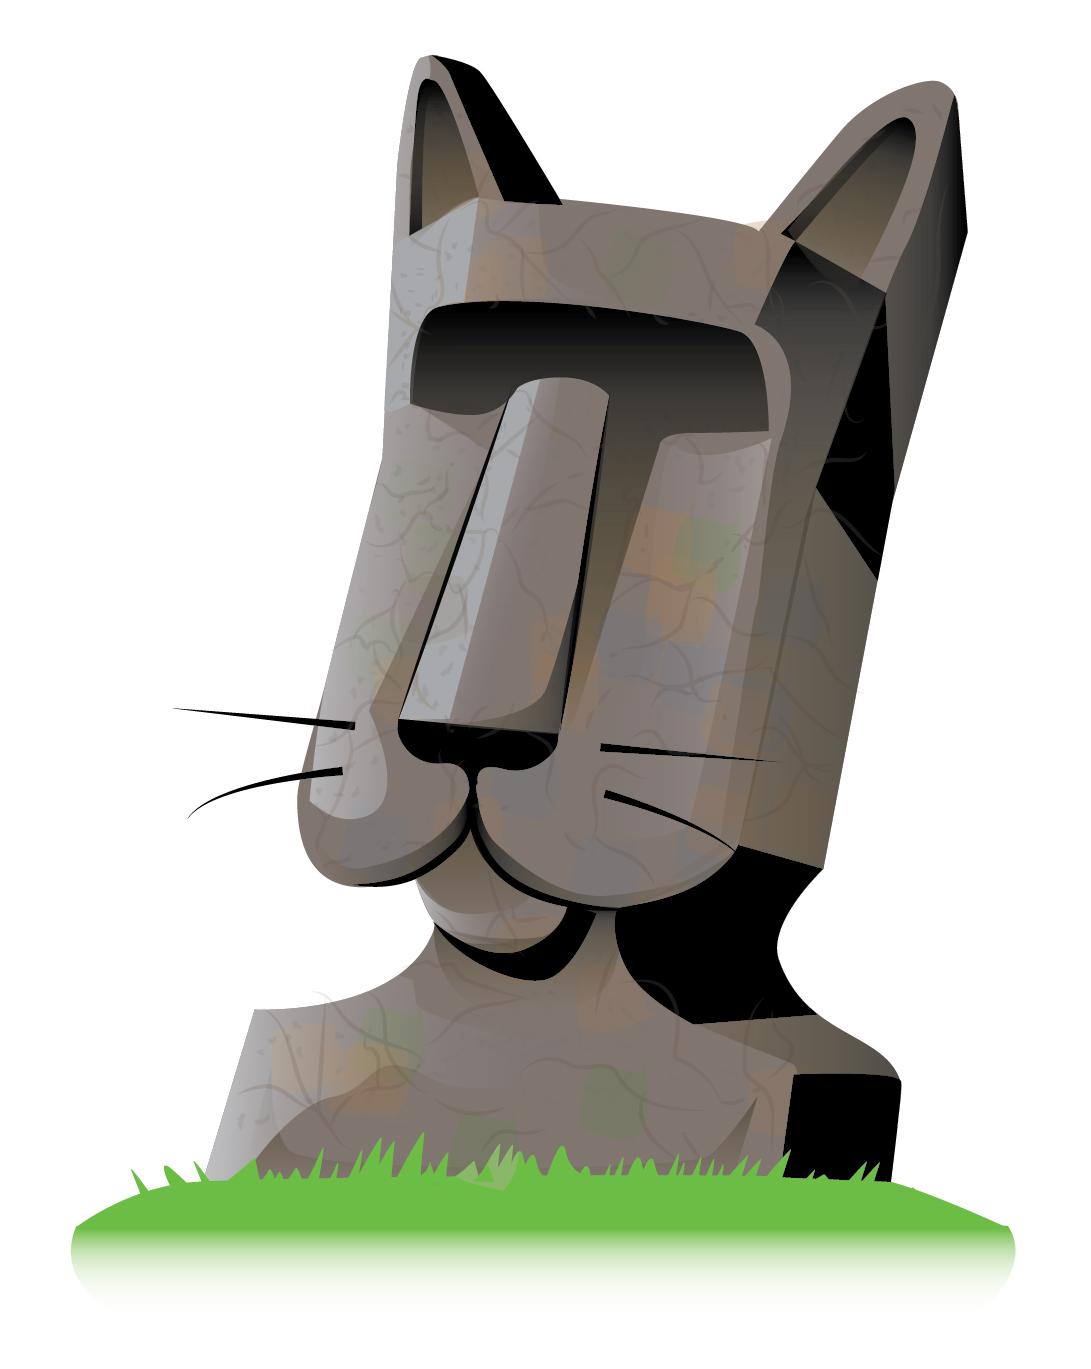 quick logo design for moai head of a cat, easter island